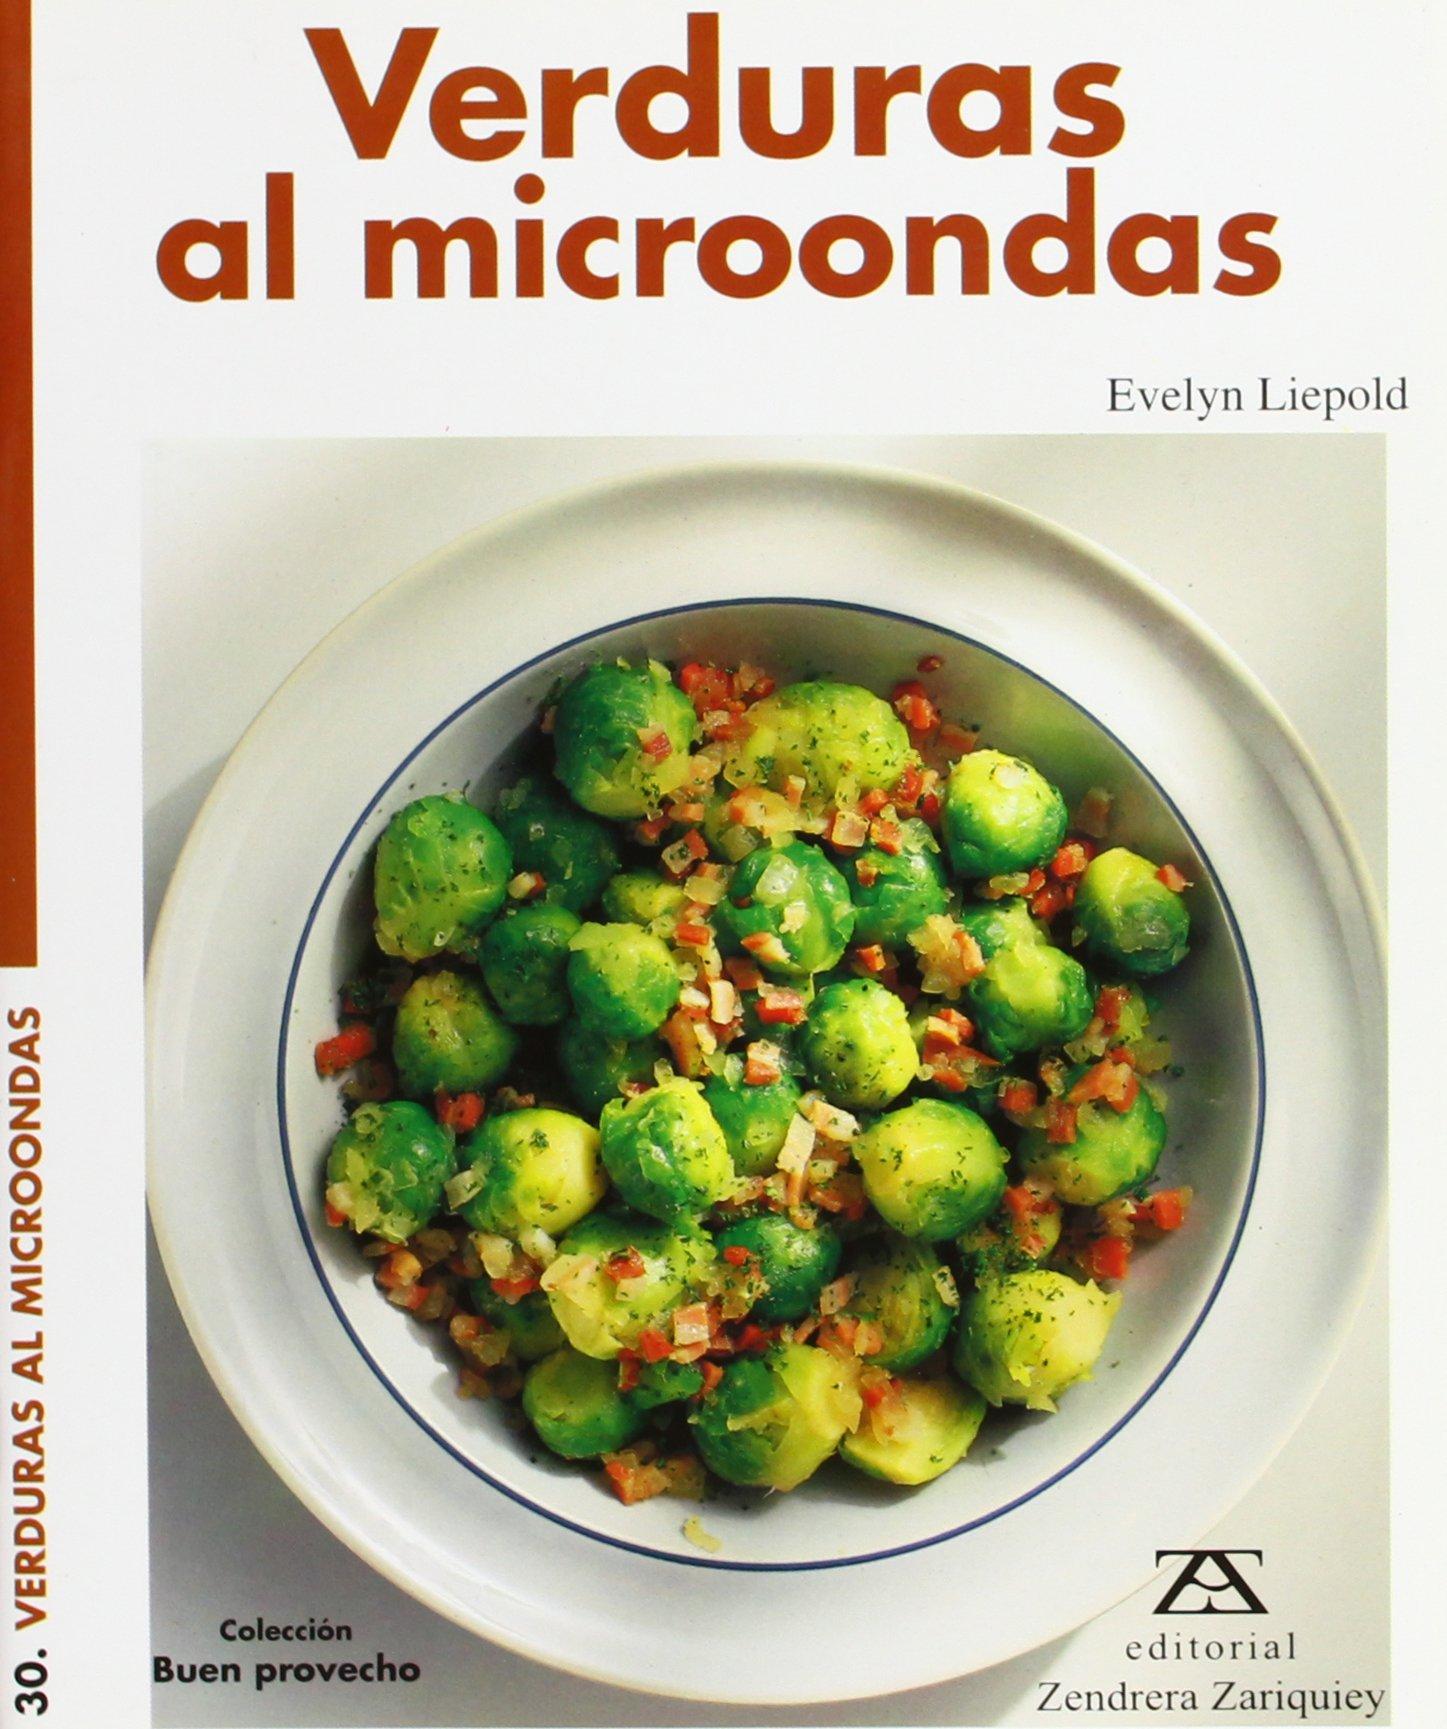 Verduras Al Microondas (Spanish Edition): Evelyn Liepold ...